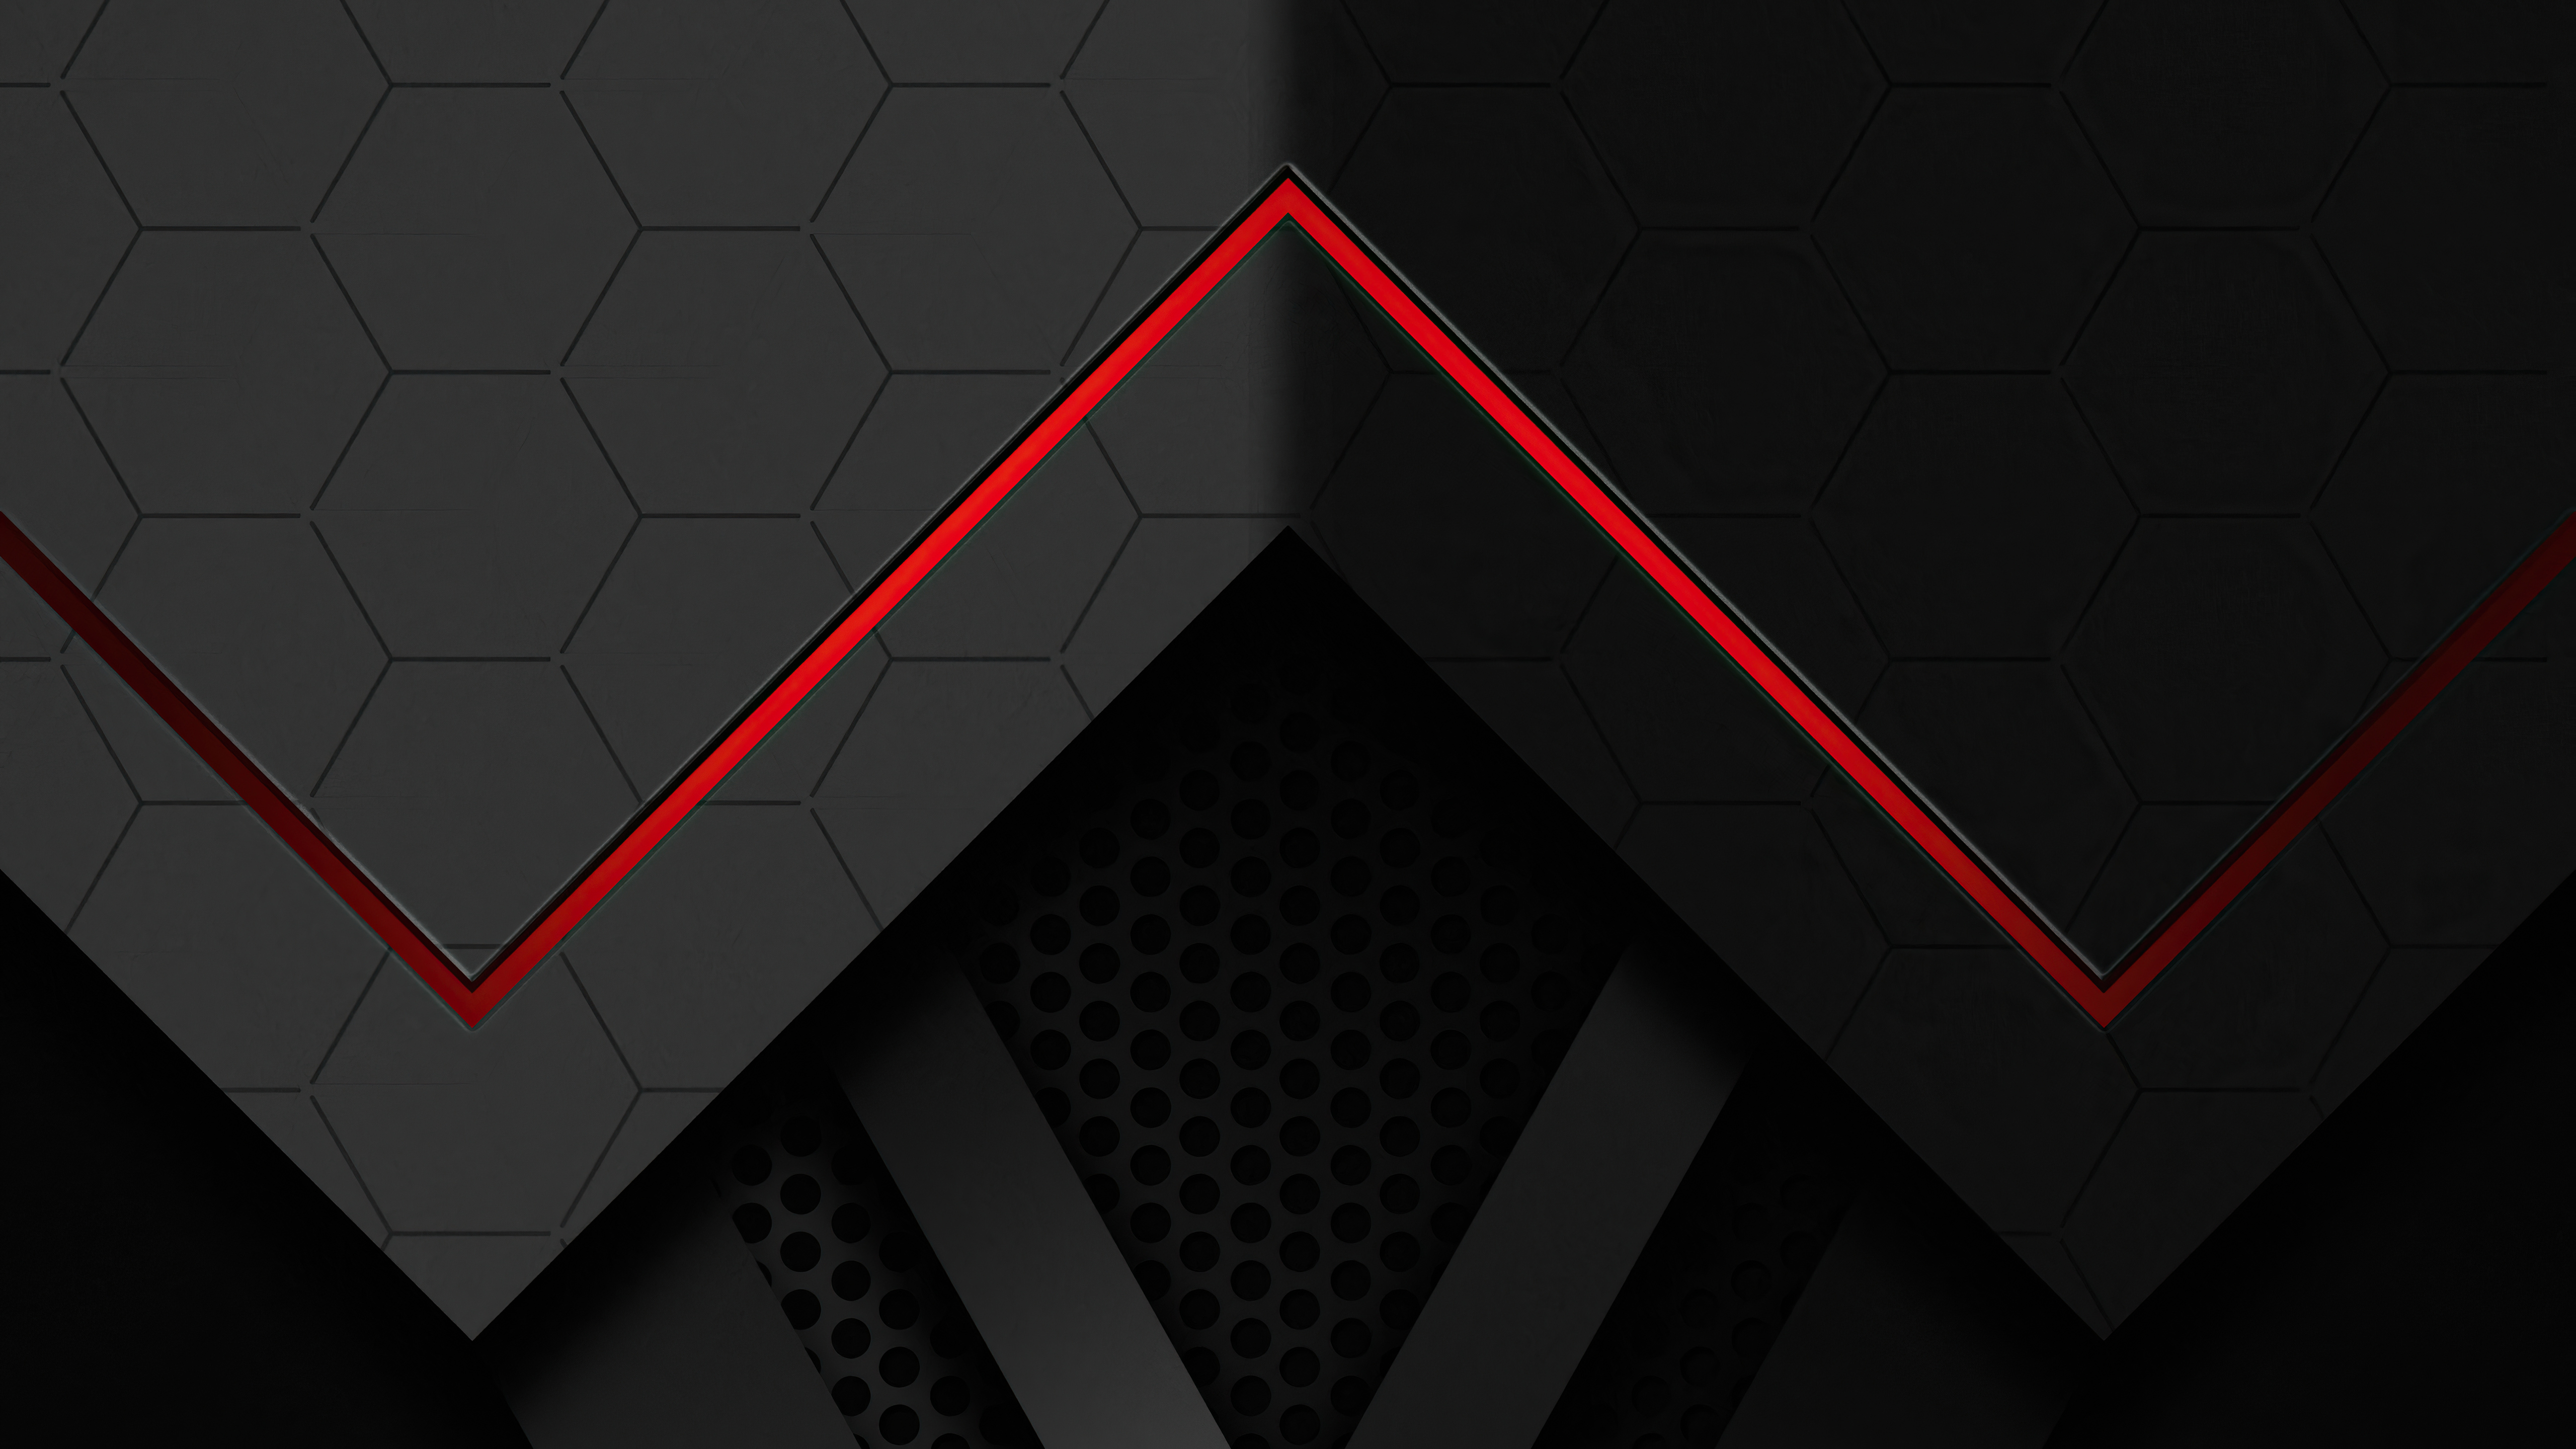 abstract dark red line 4k 1616870925 - Abstract Dark Red Line 4k - Abstract Dark Red Line 4k wallpapers